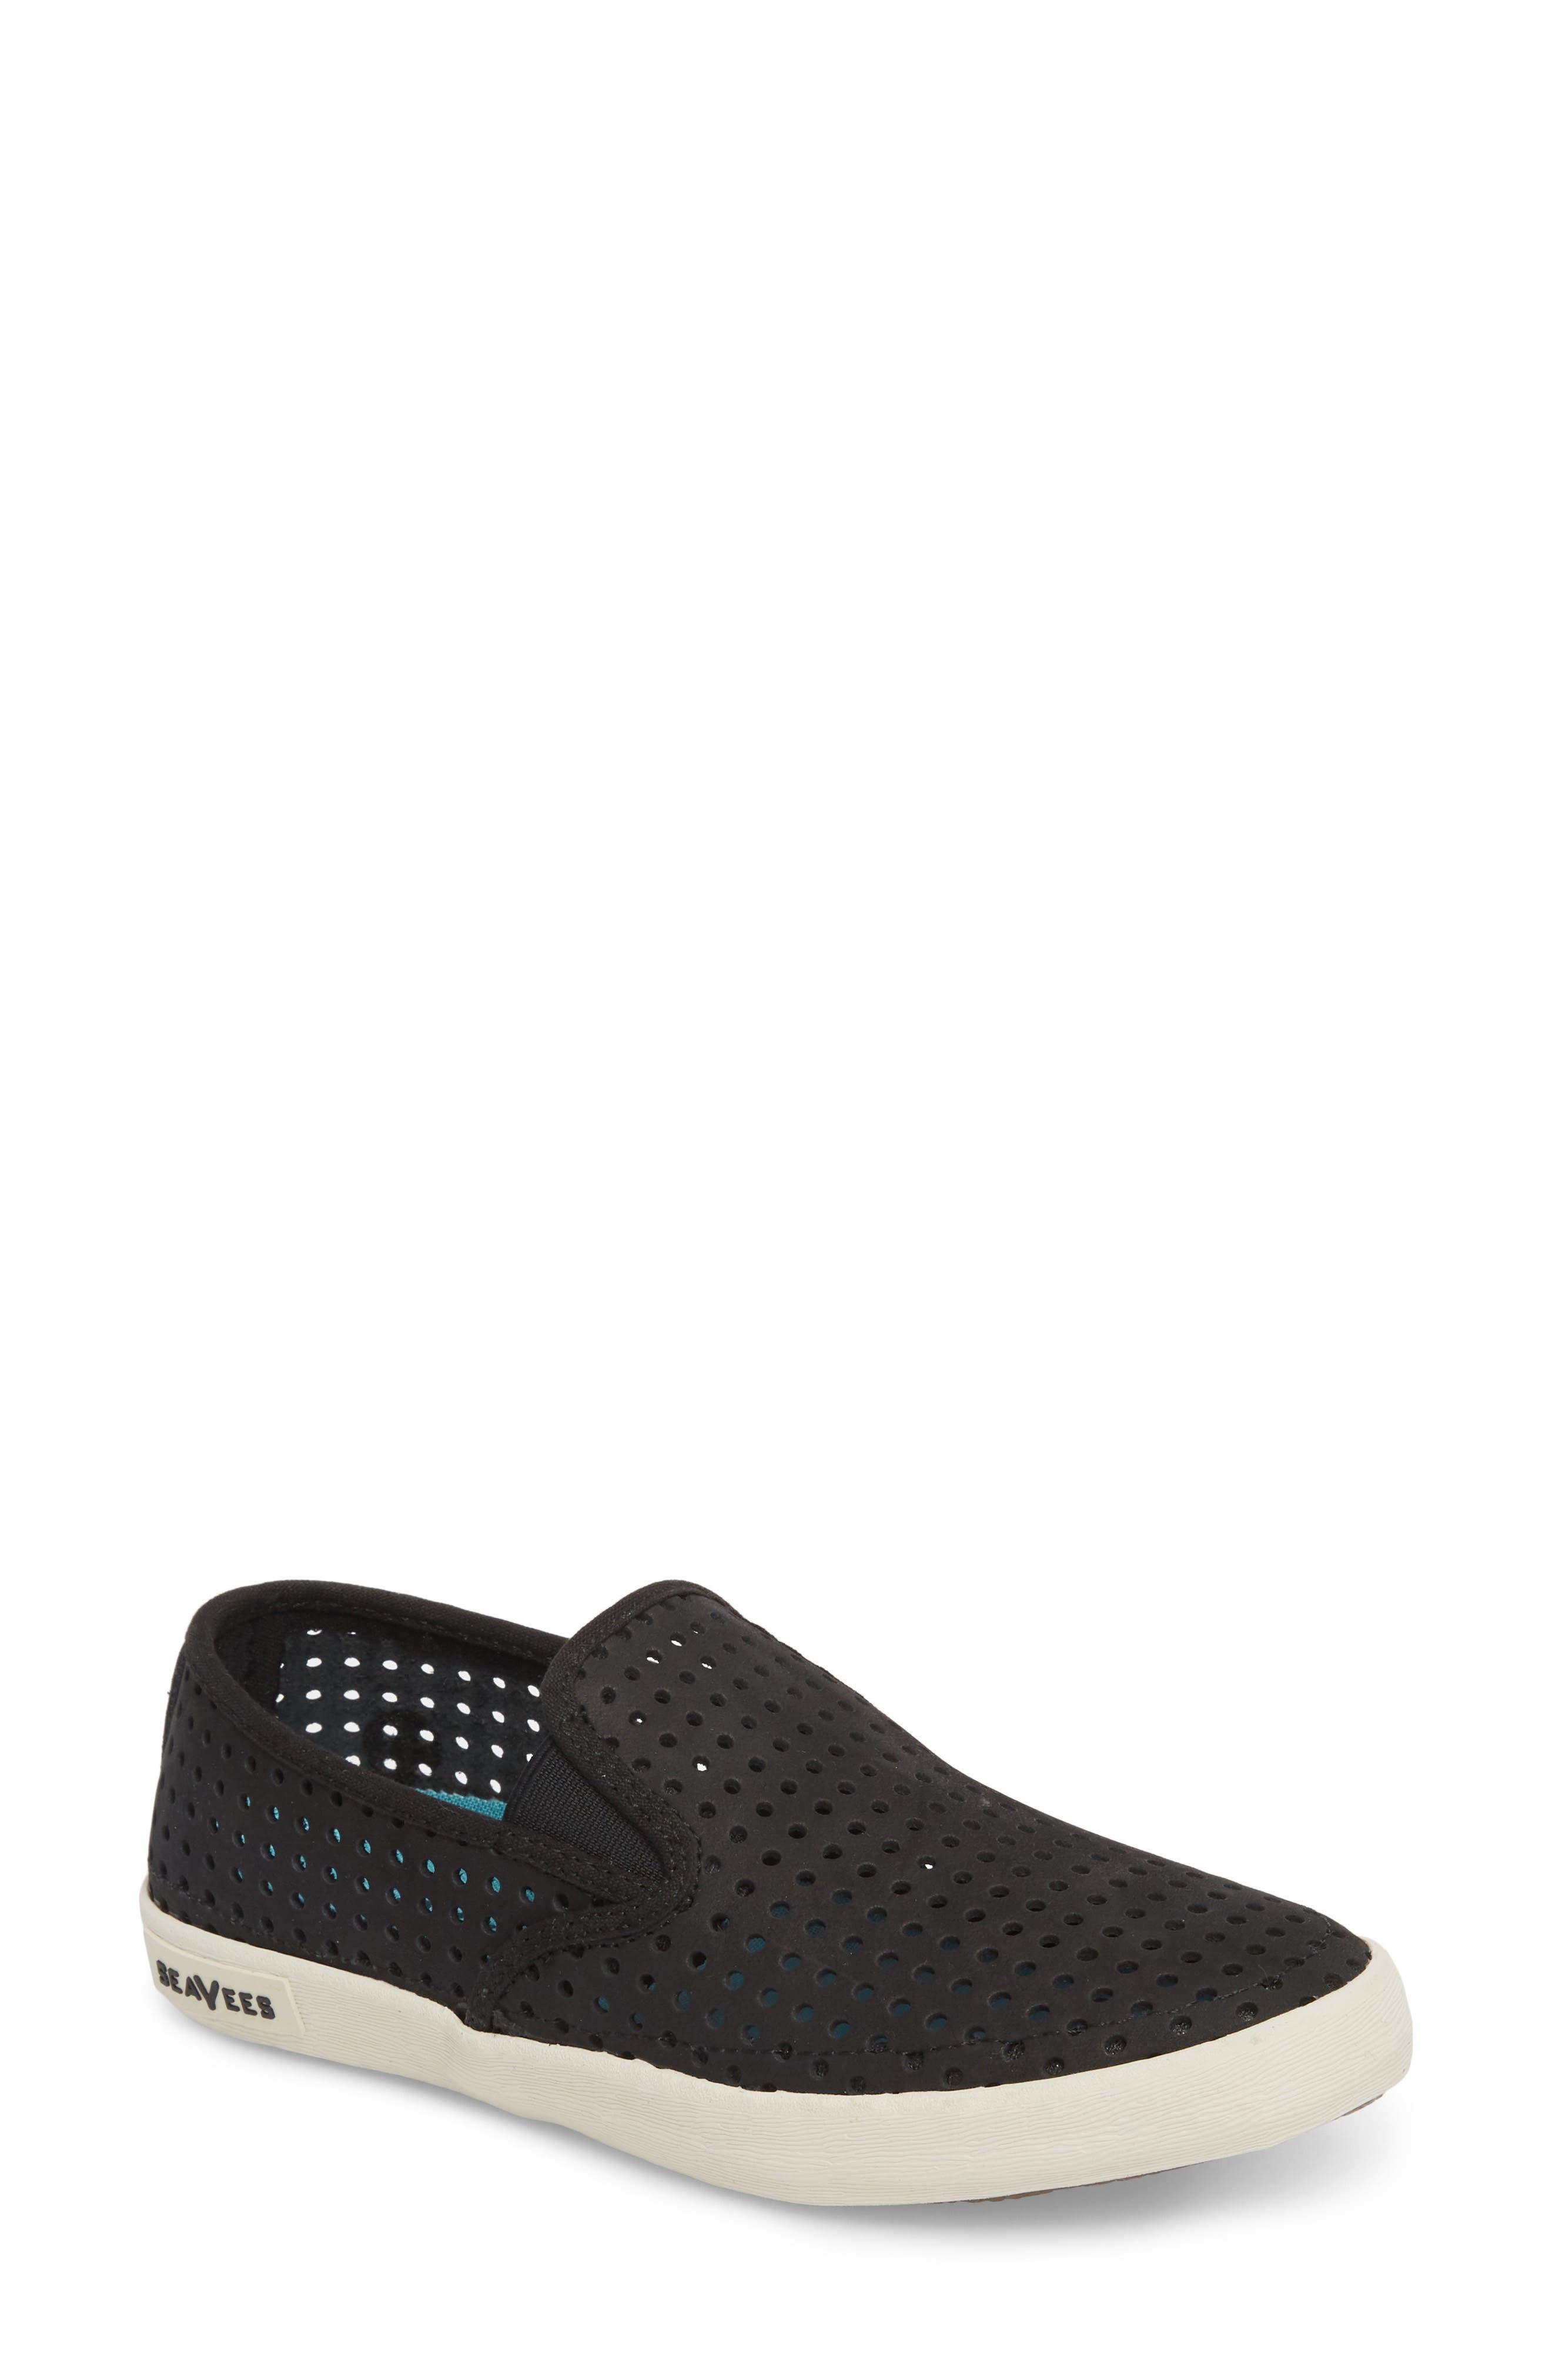 Baja Perforated Slip-On Sneaker,                         Main,                         color, BLACK